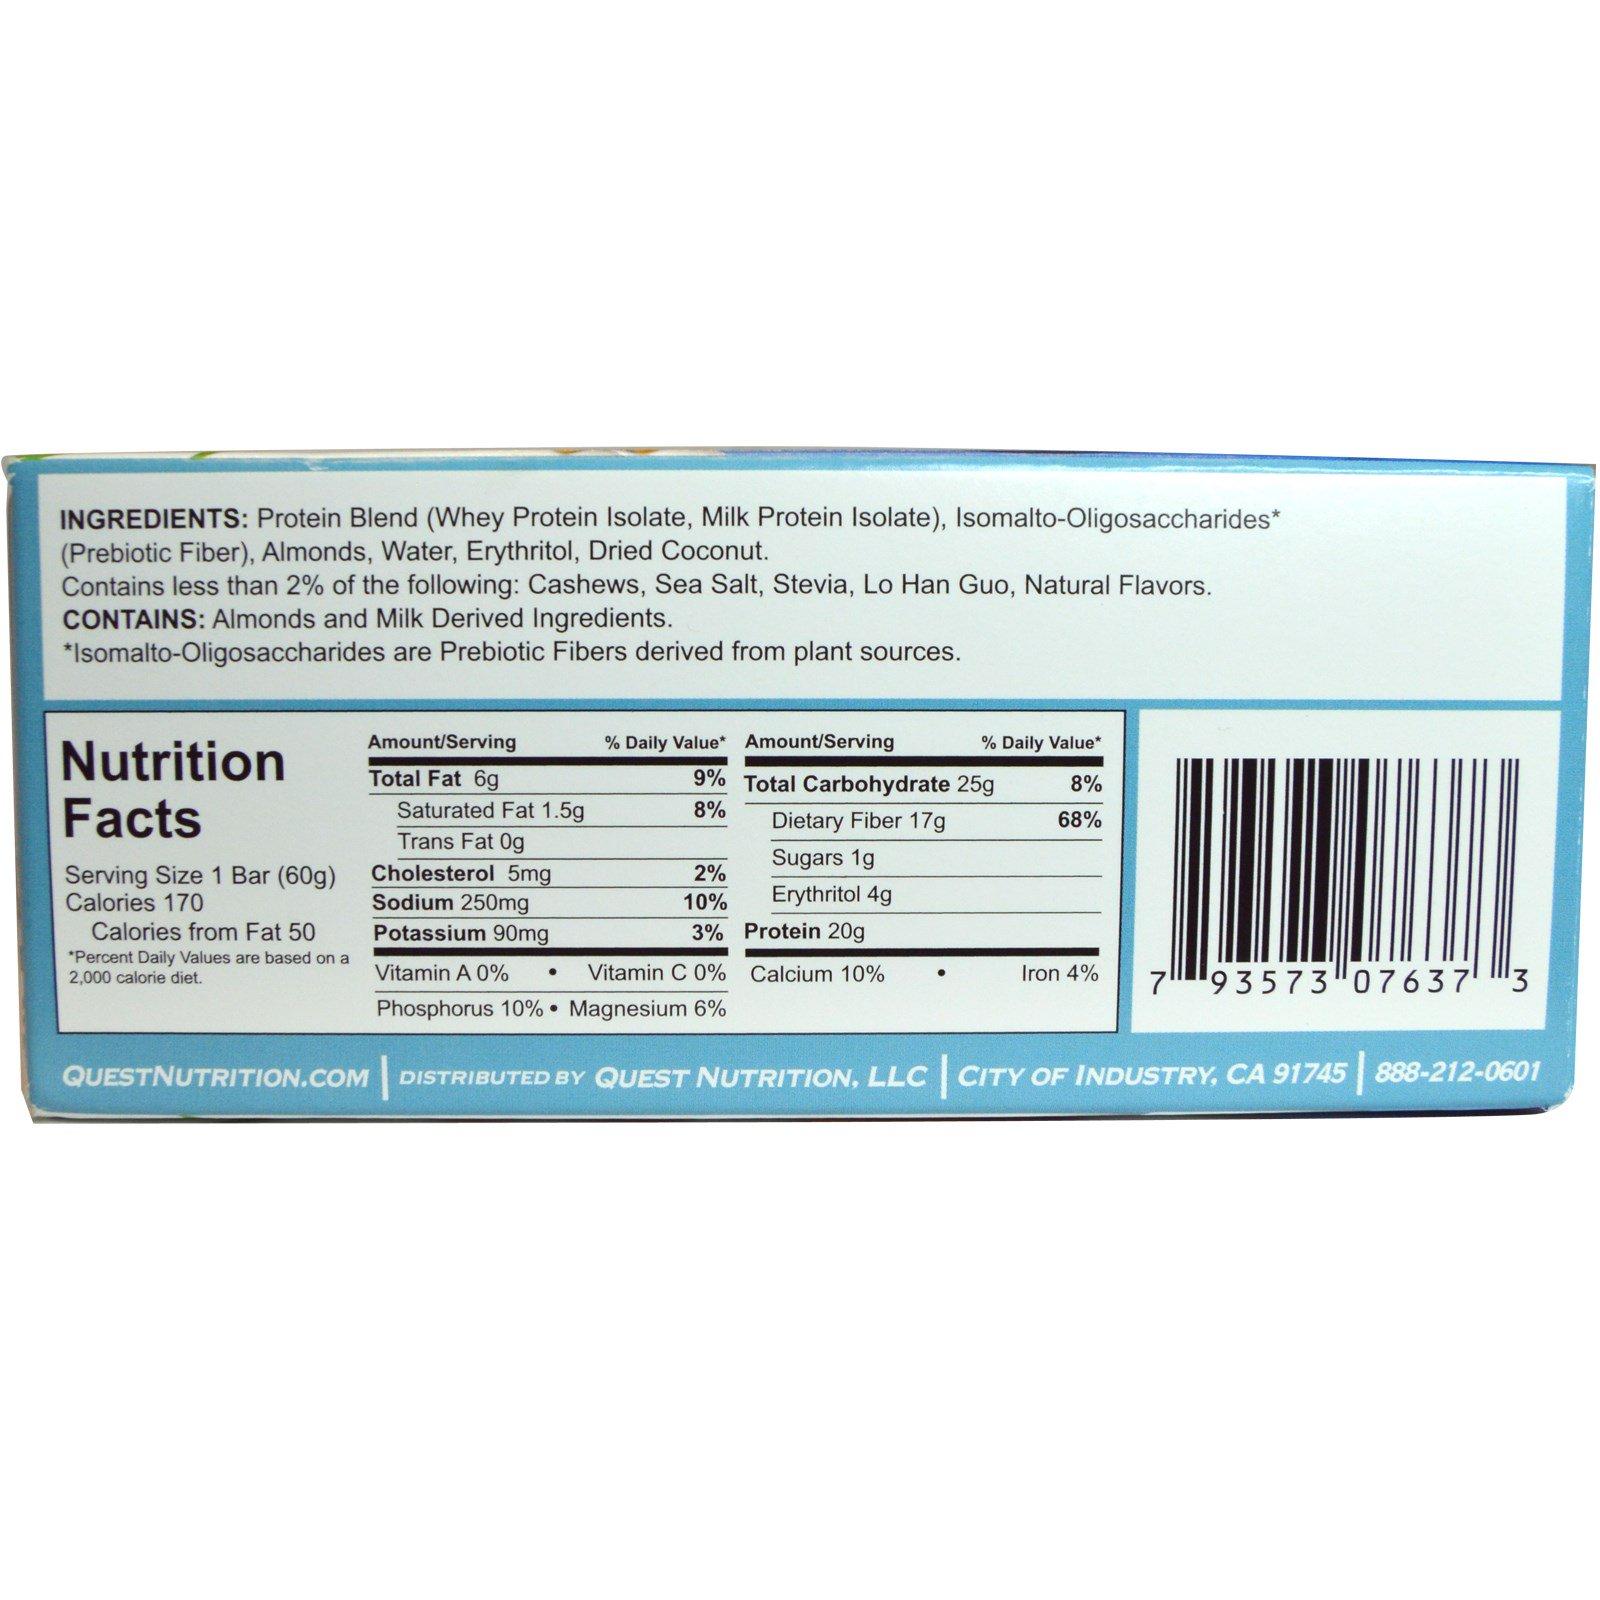 Isomalto-oligosaccharides fdating